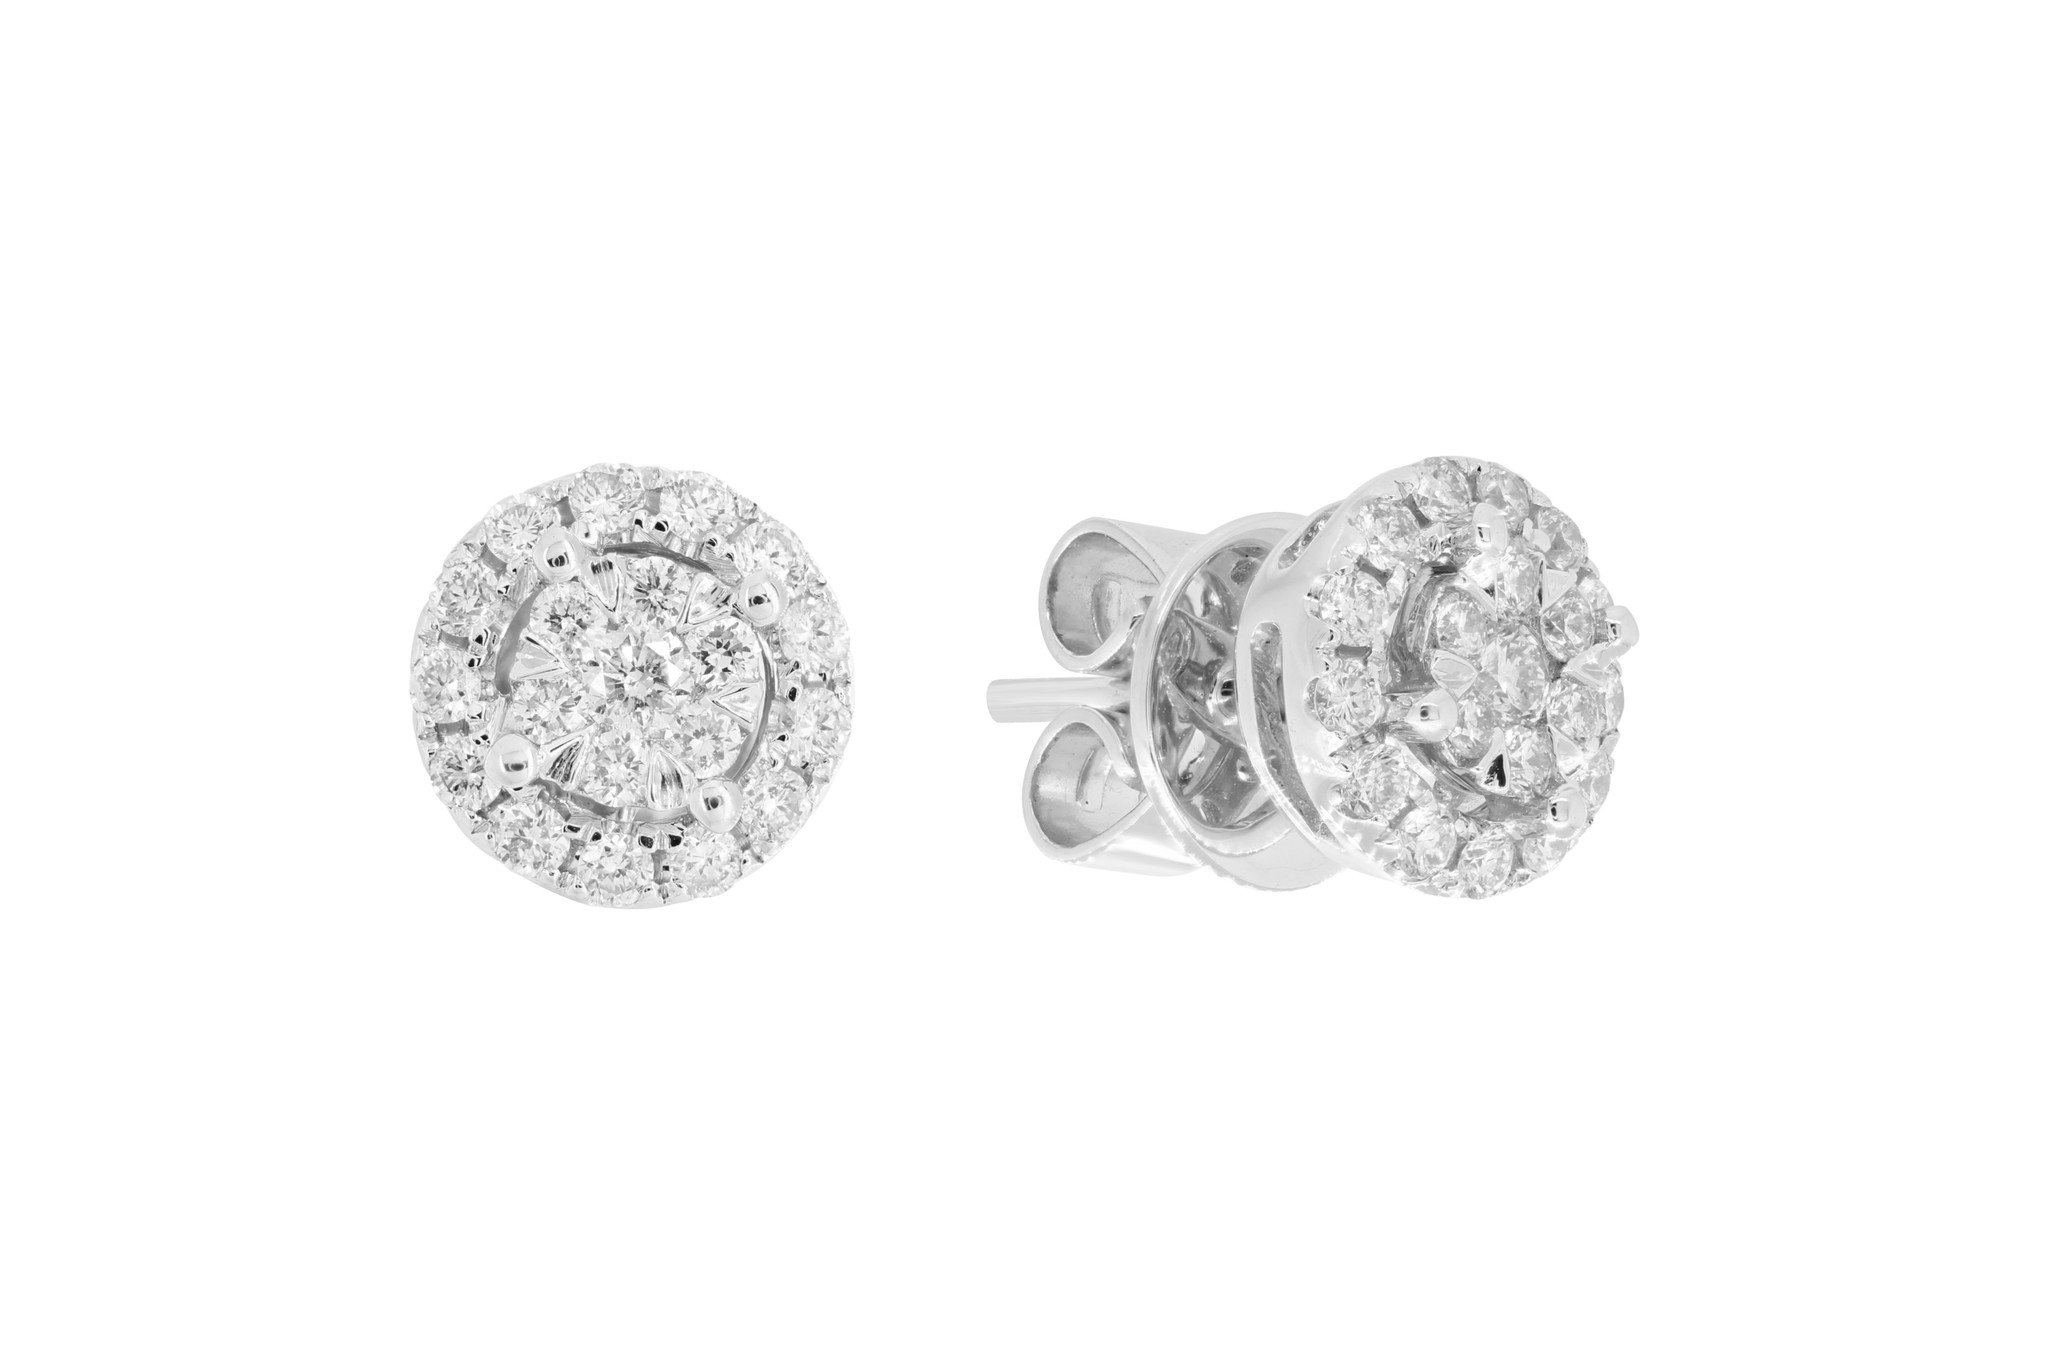 London Fine Jewelry 14K White Gold 0.45 cttw Round-Cut Diamond Pressure Stud Earrings